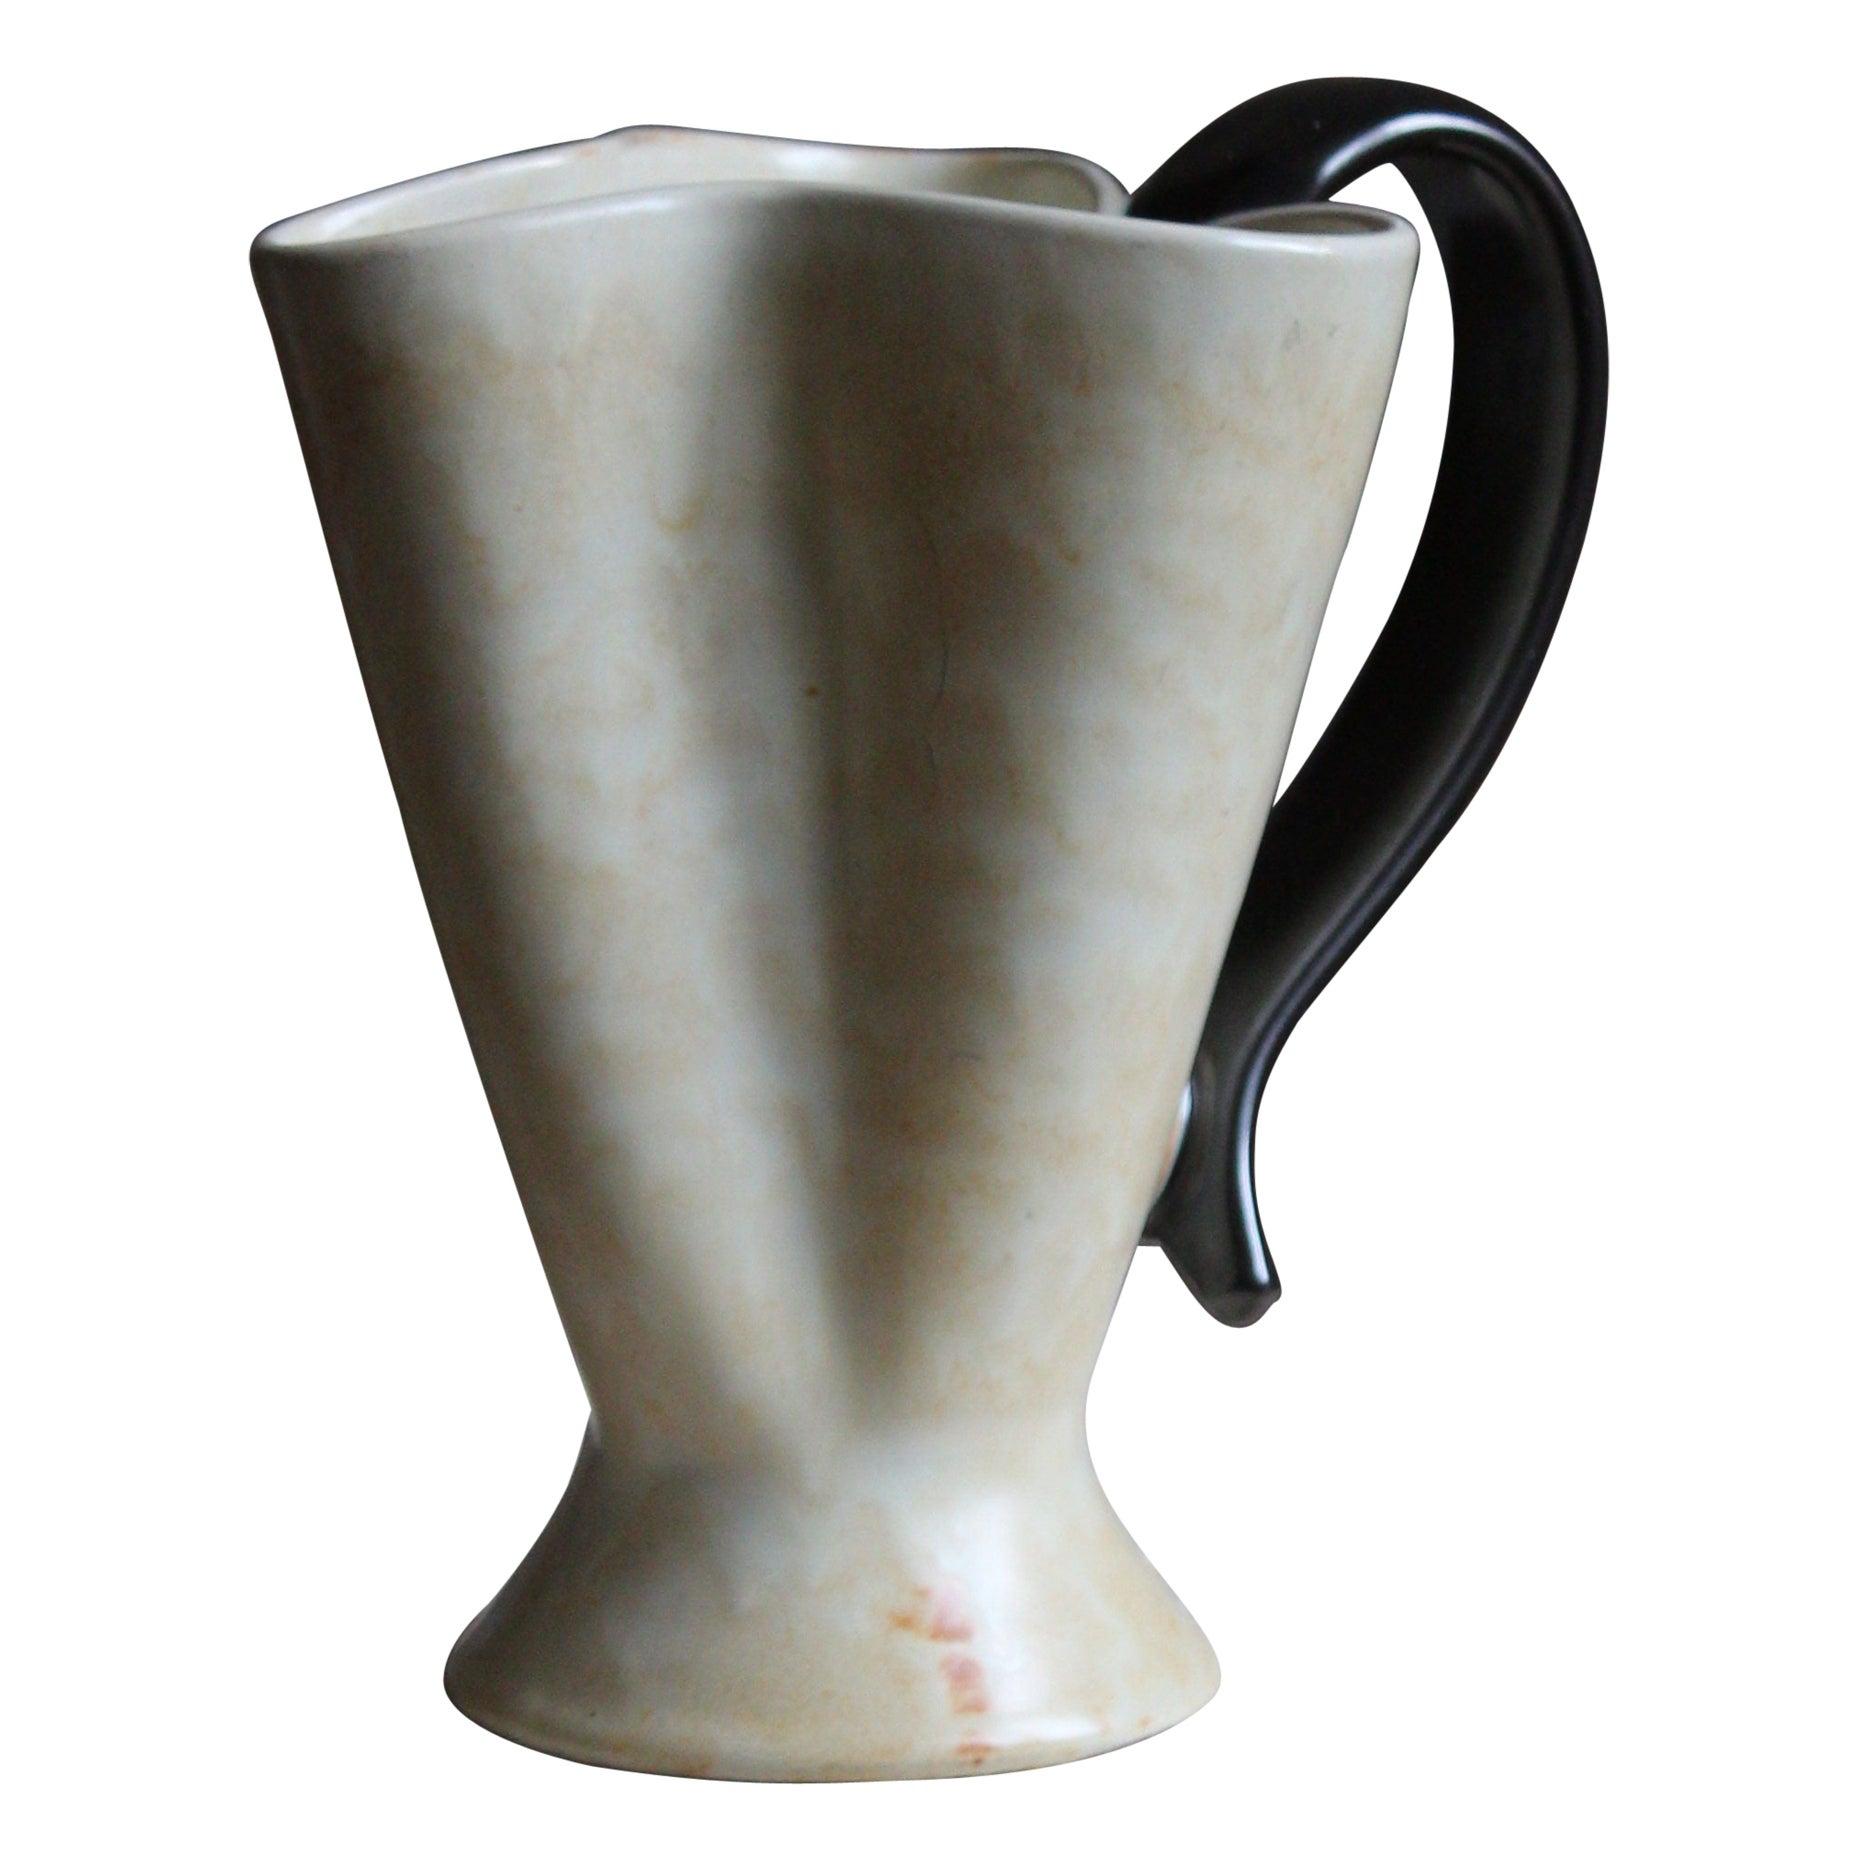 Upsala-Ekeby, Vase or Pitcher, Glazed Stoneware, Sweden, 1940s